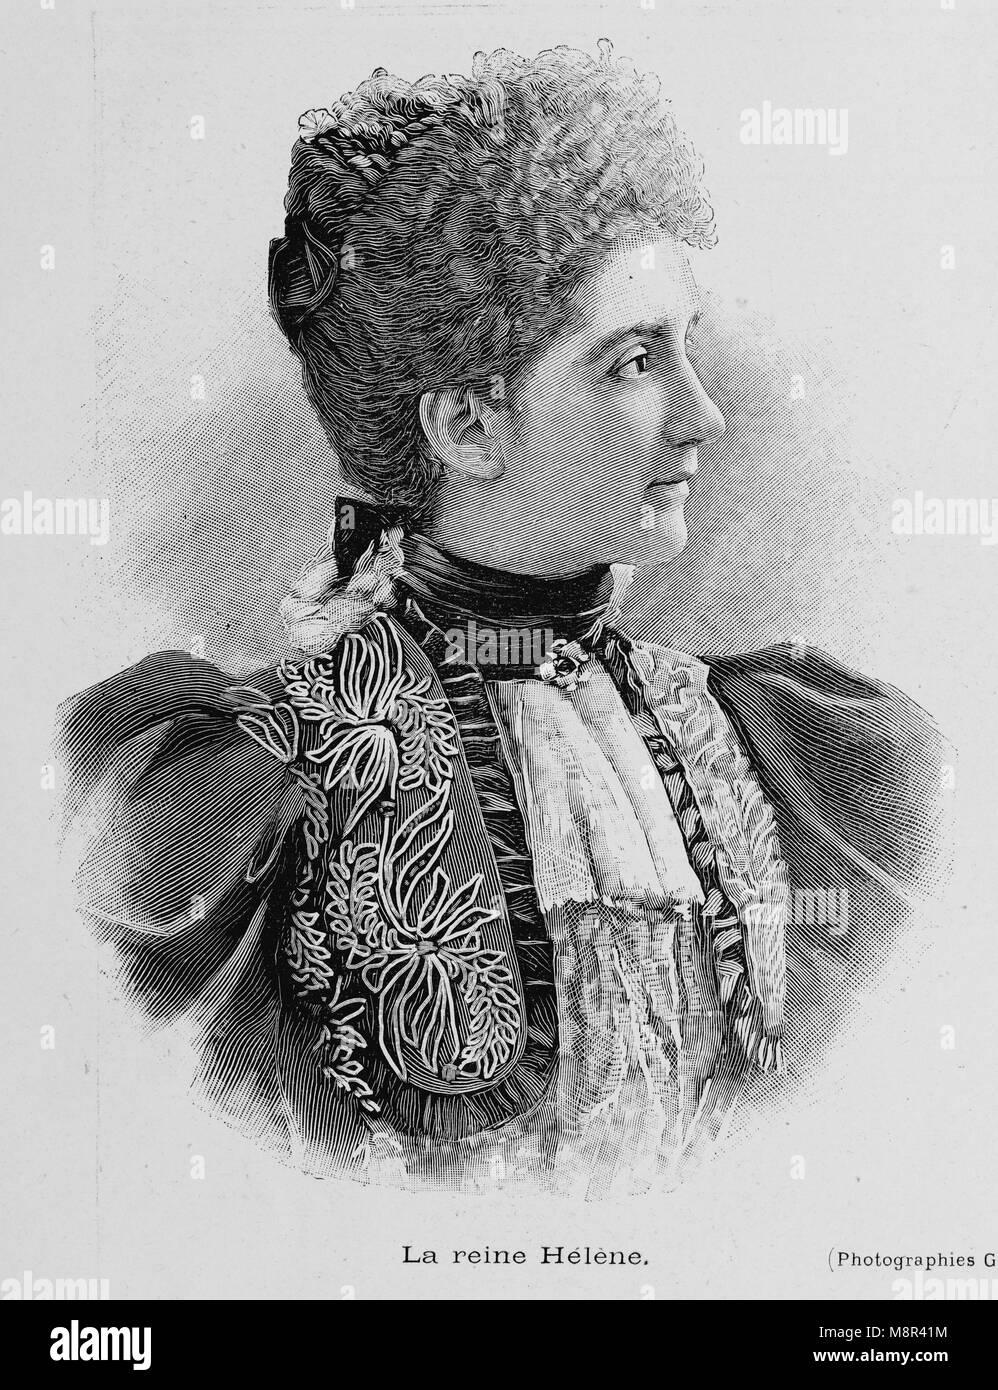 La reina Elena de Montenegro, la esposa del rey Victor Emmanuel III de Italia, imagen del semanario francés Imagen De Stock